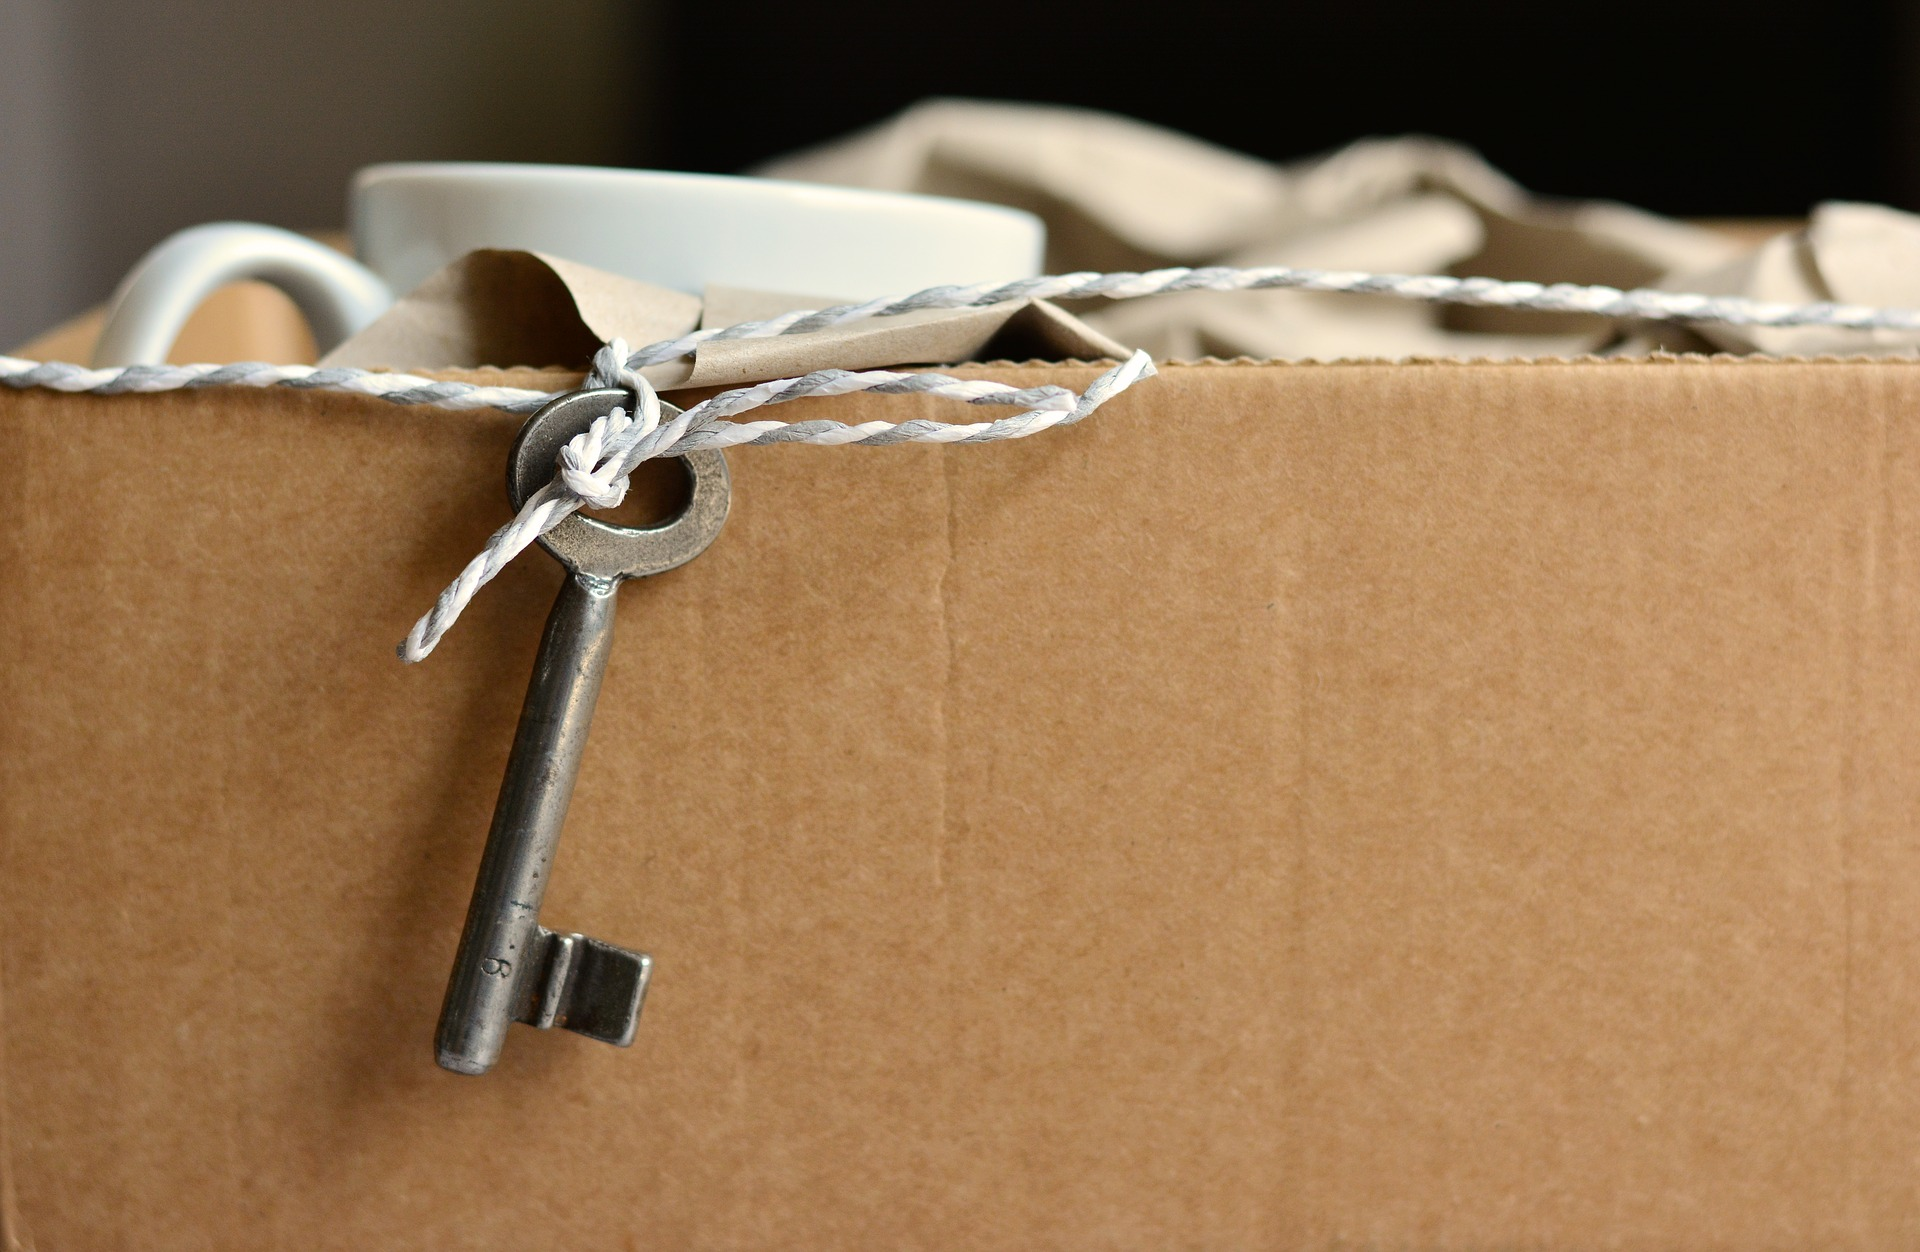 move_2481718_1920_1.jpg